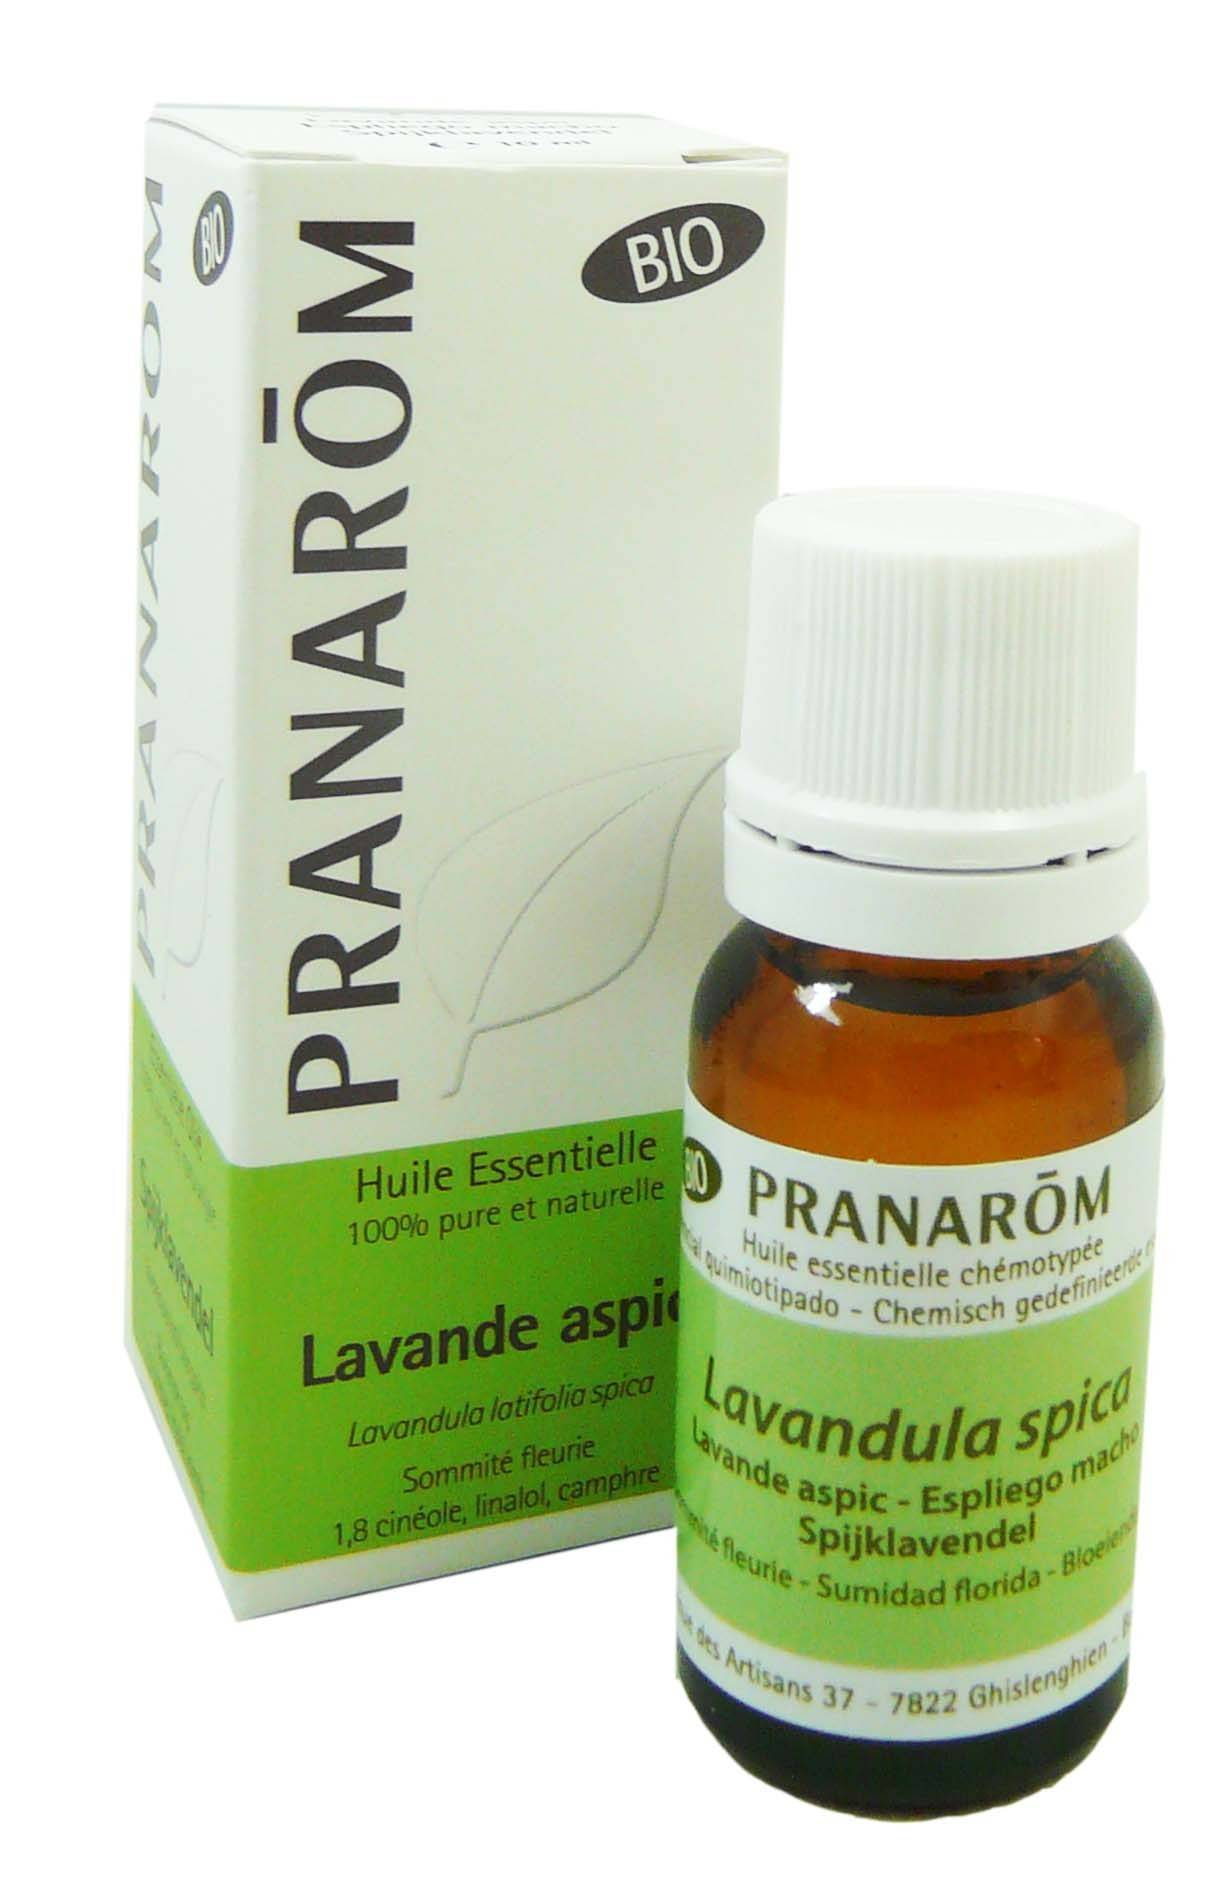 Pranarom huile essentielle bio lavande aspic10ml